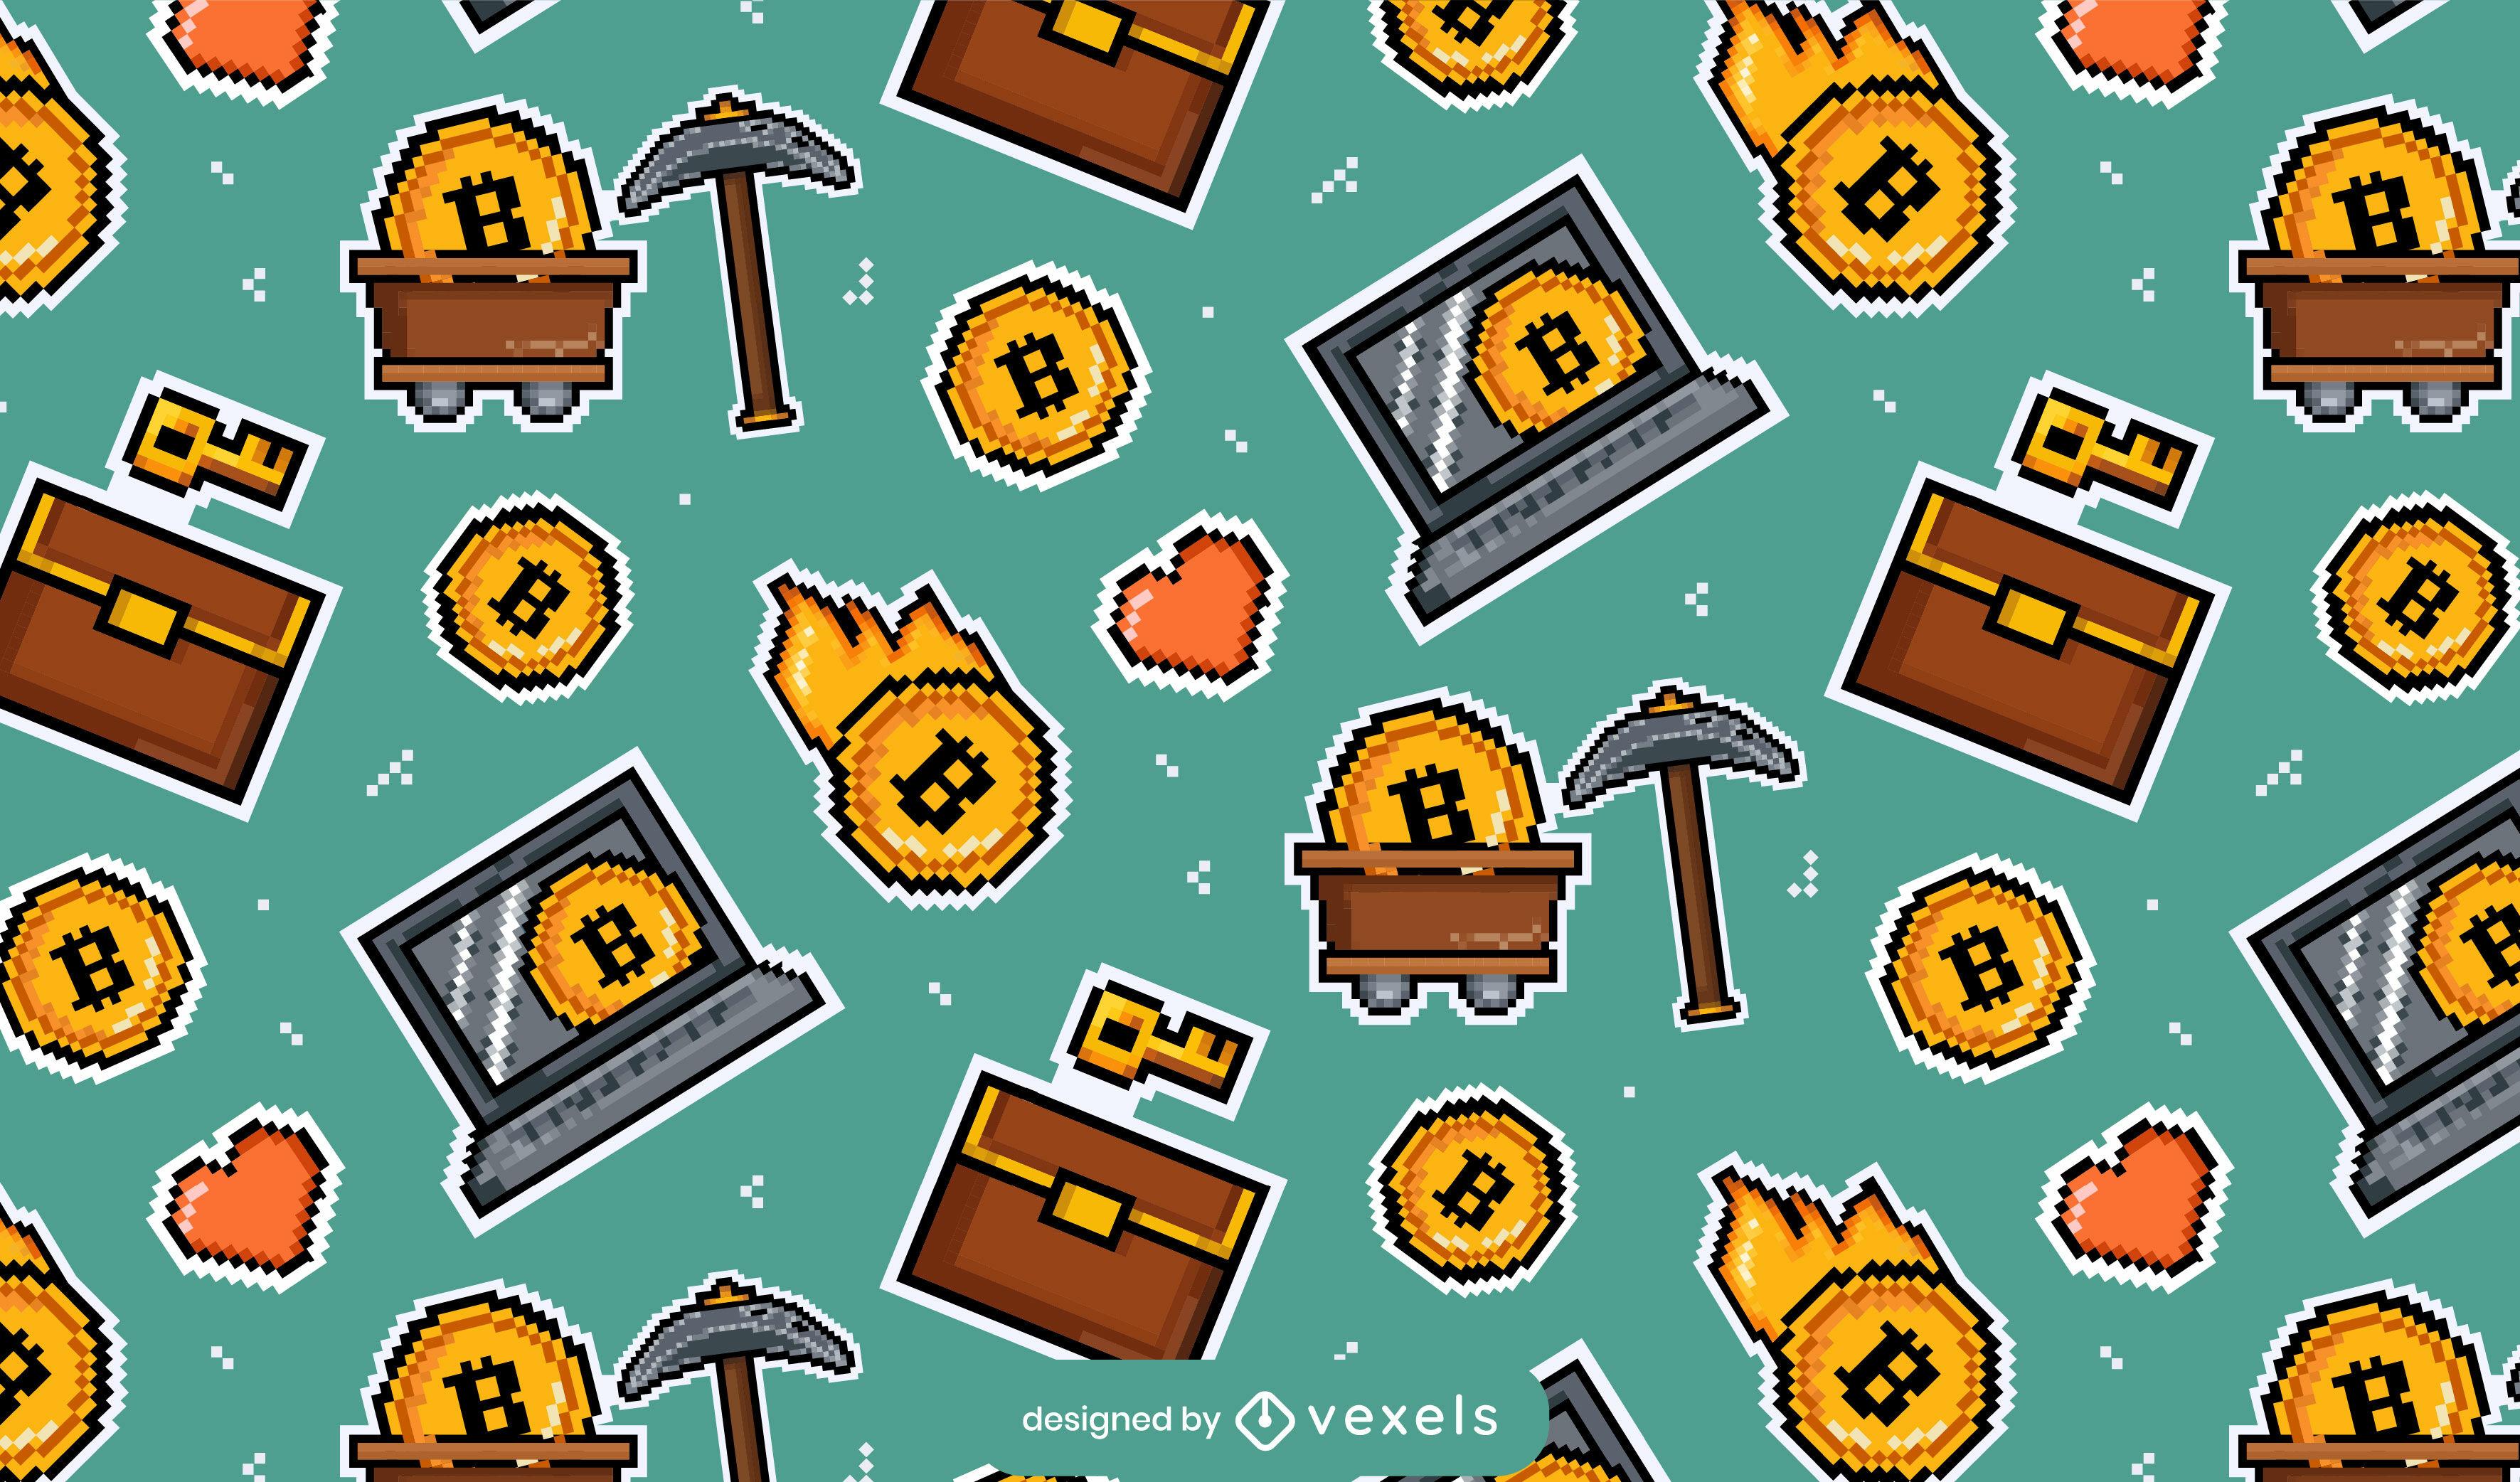 Pixel-Art-Muster von Bitcoin-Elementen